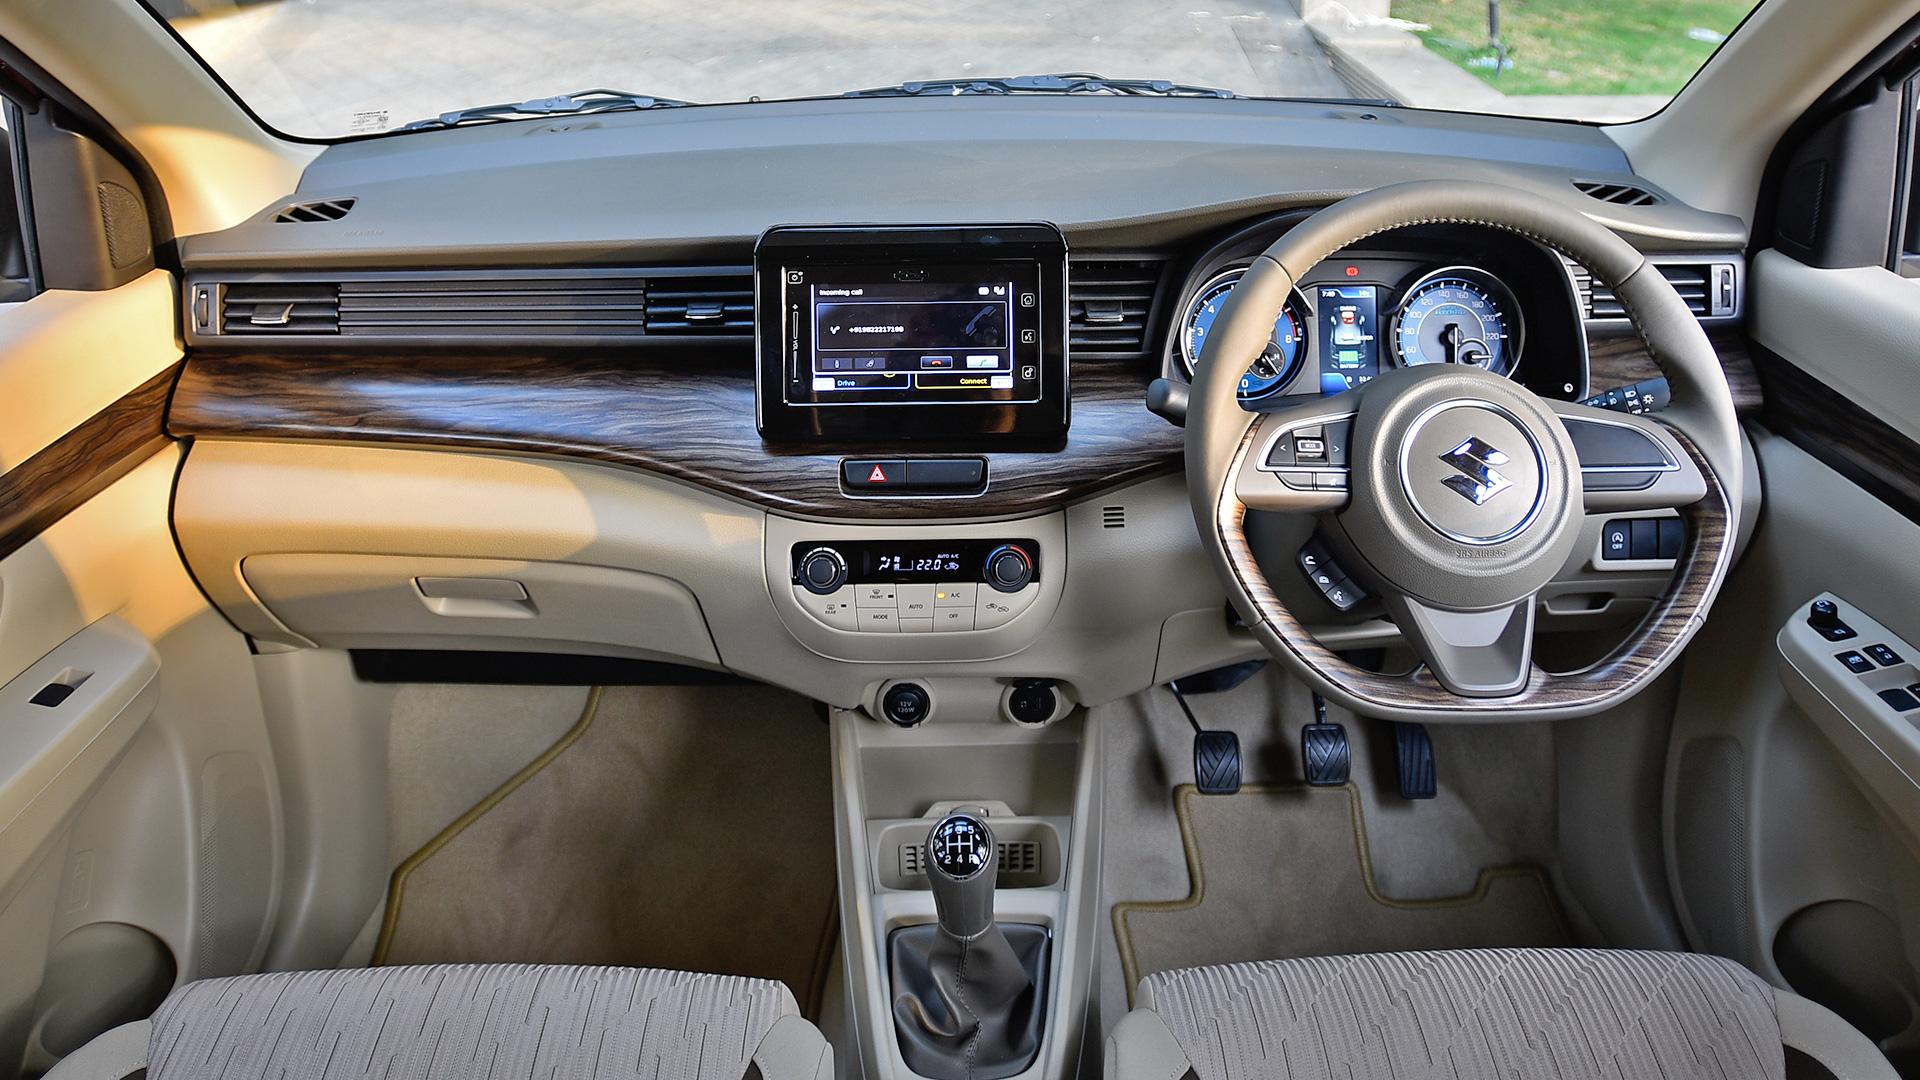 Maruti Suzuki Ertiga 2019 Zxi Plus Interior Car Photos Overdrive